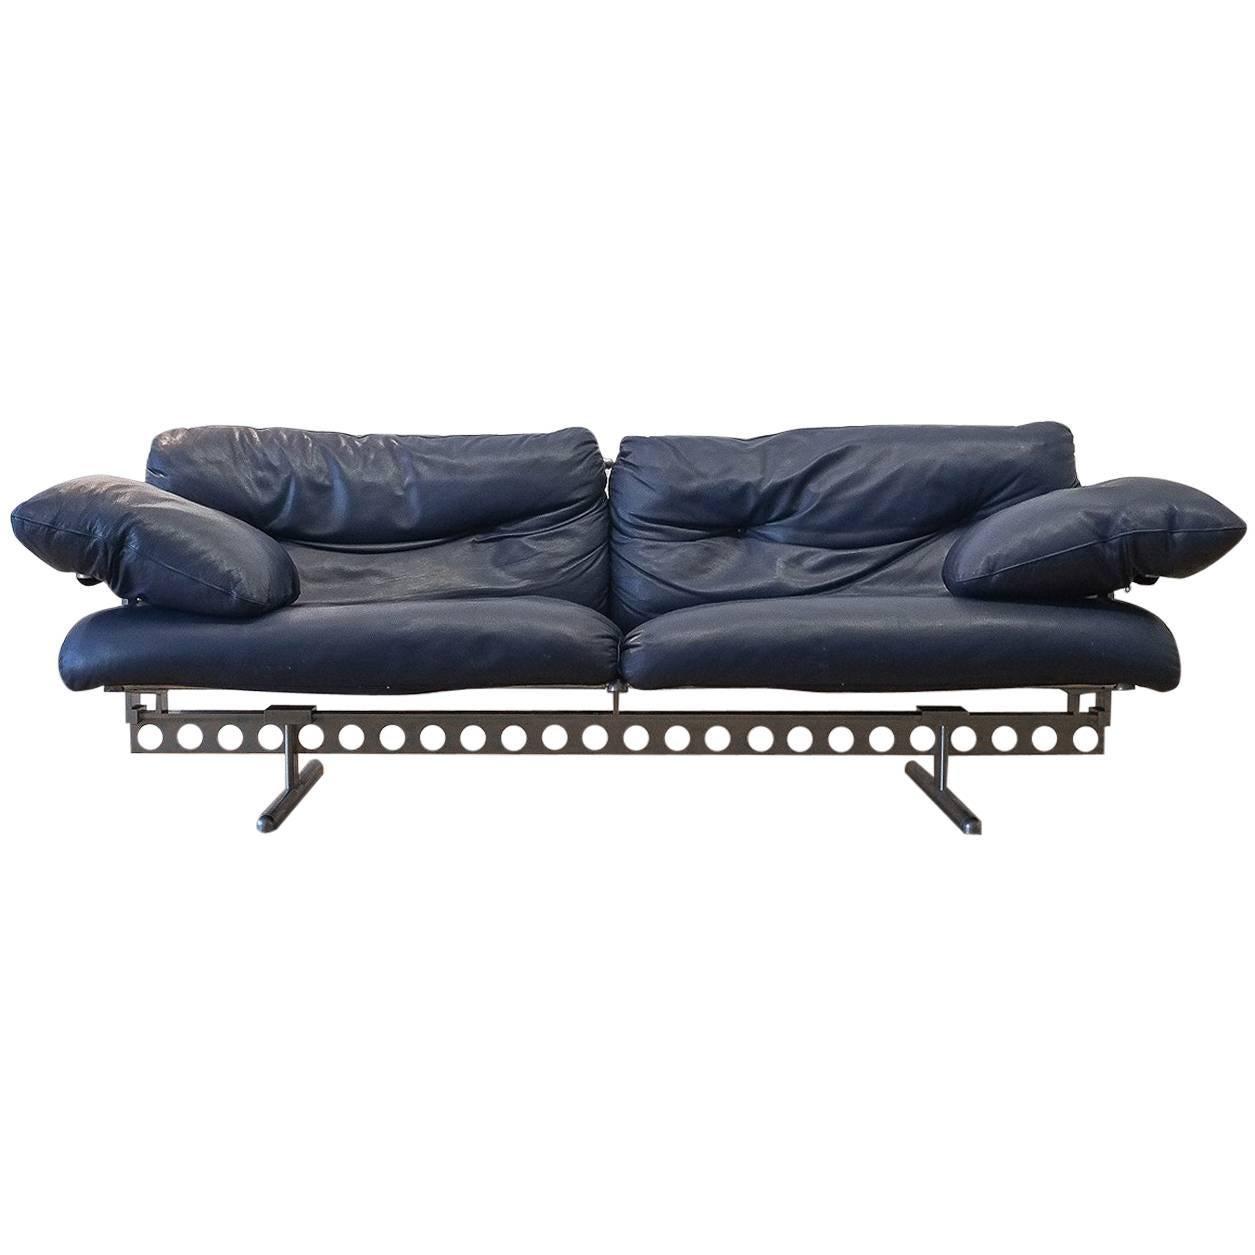 Superbe Pierluigi Cerri Ouverture Leather Sofa For Poltrona Frau, Italy, 1980 For  Sale